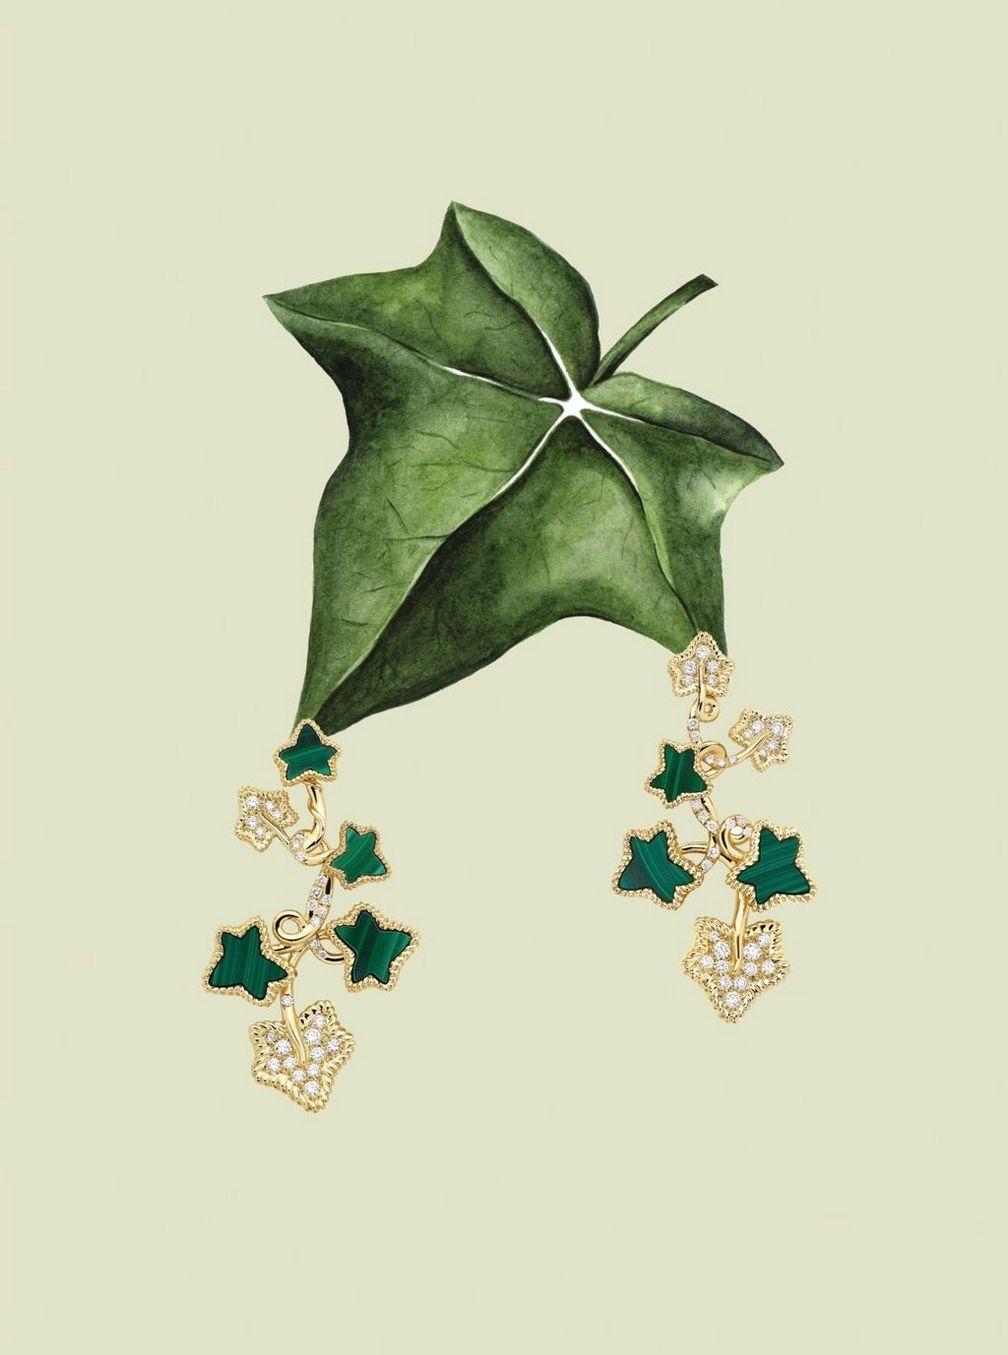 Серьги Leaves of Love из желтого золота с малахитом и бриллиантами от Dior Joaillerie